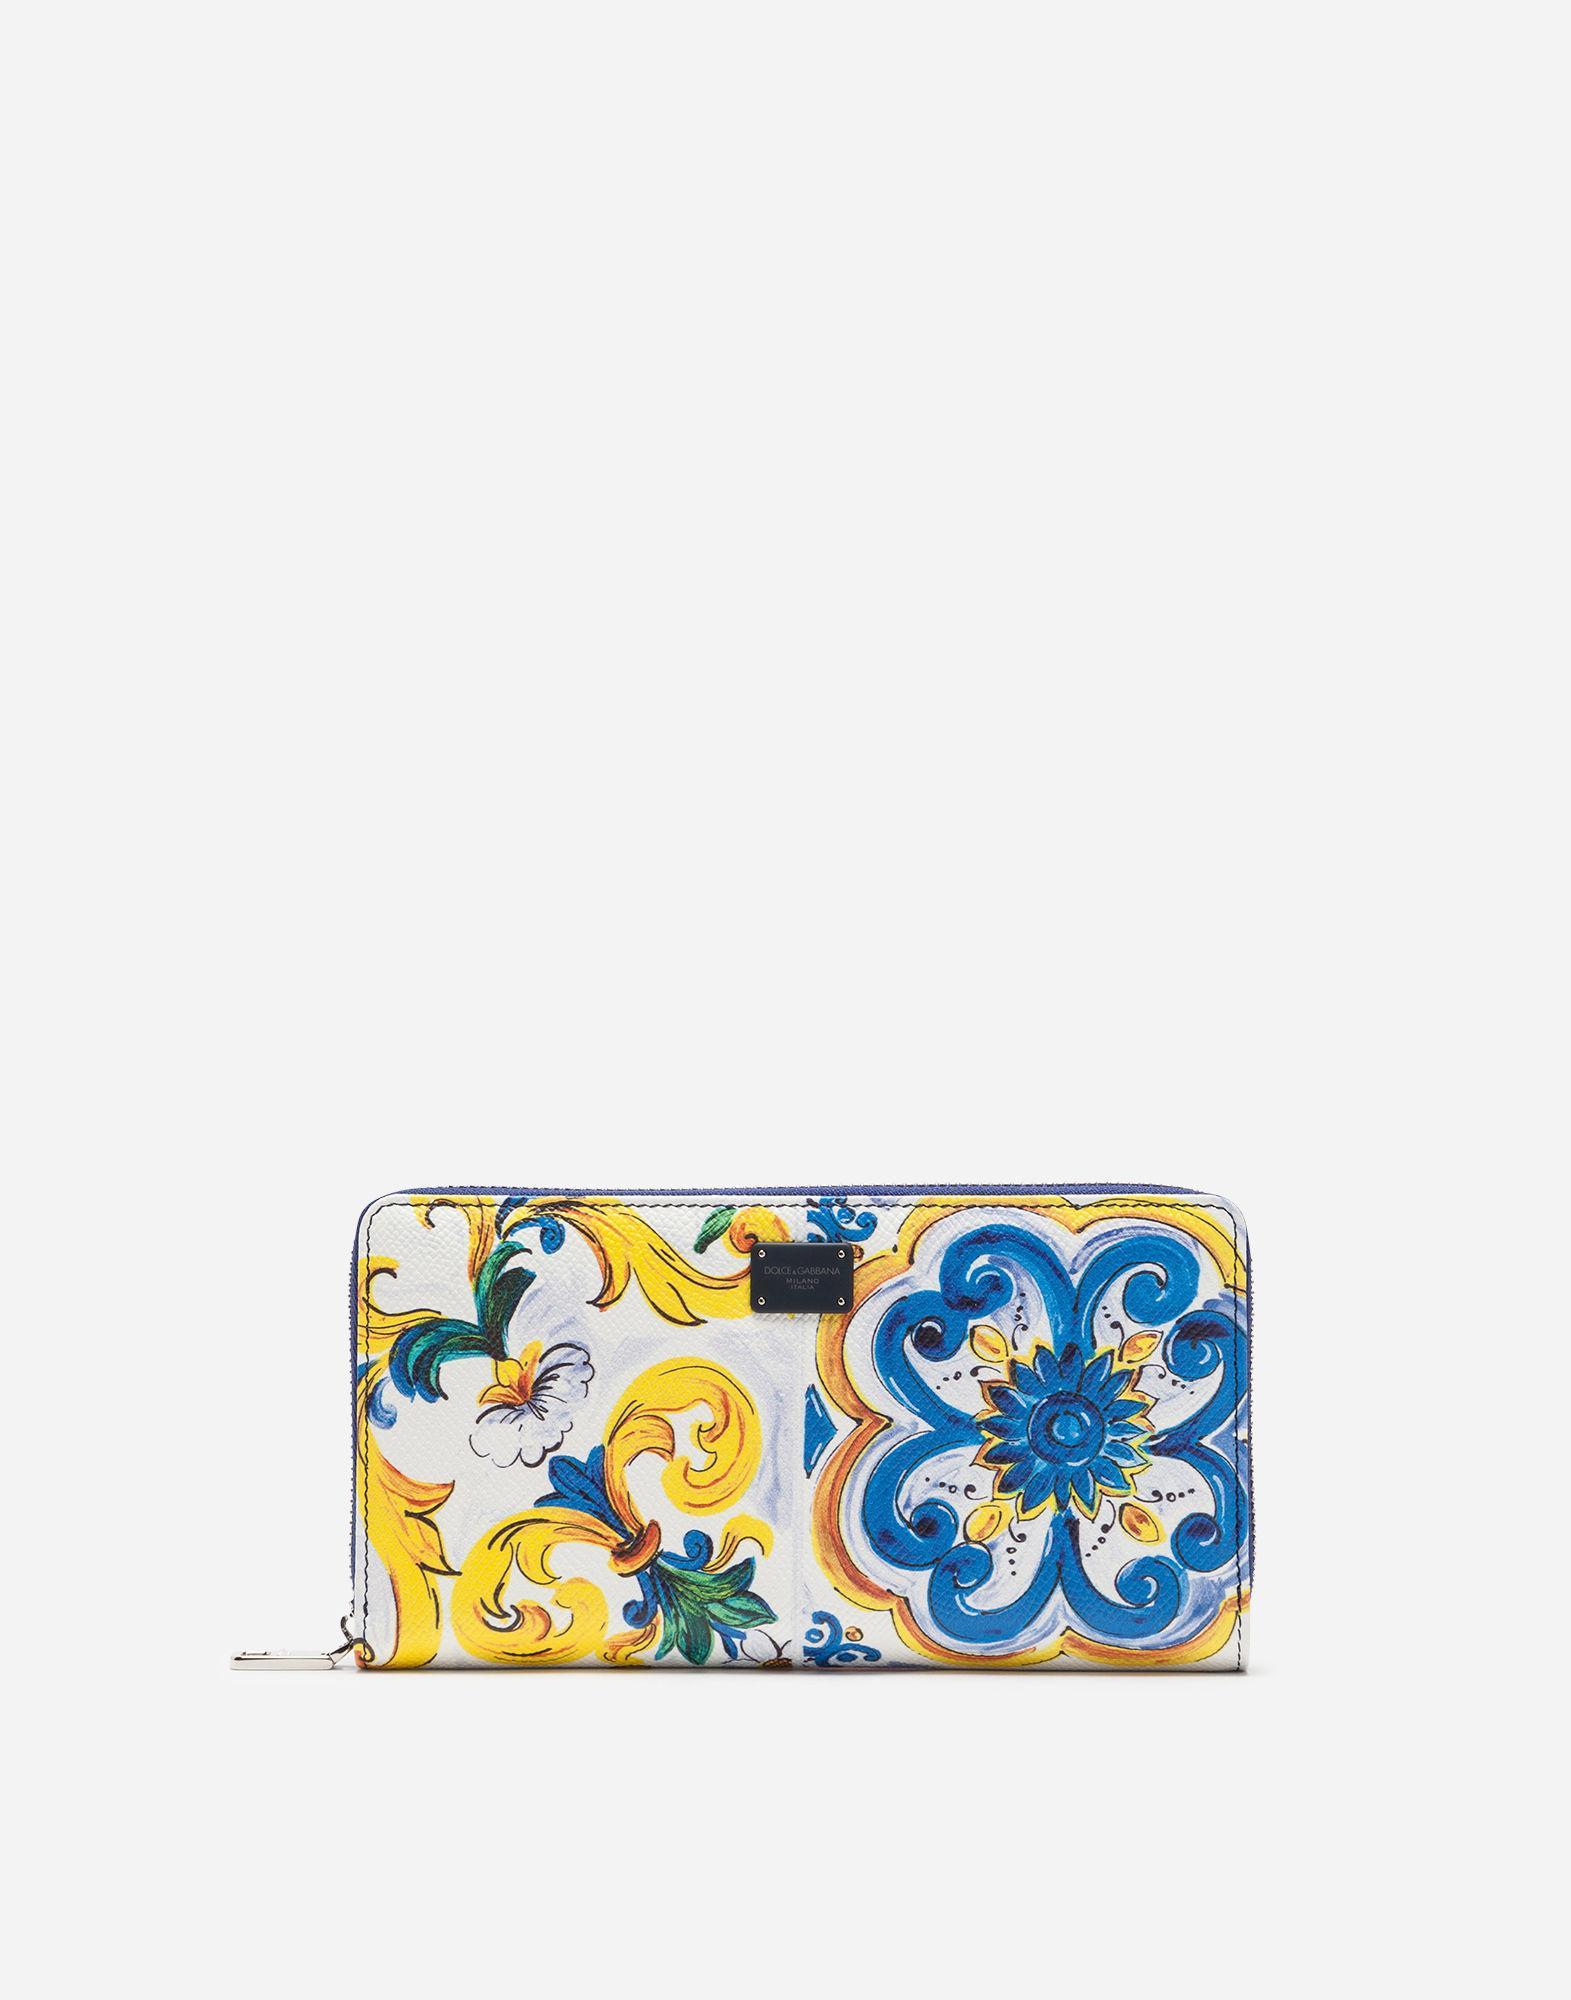 cf2fb87035 Dolce & Gabbana Zip-Around Wallet In Printed Dauphine Calfskin In Majolica  Print